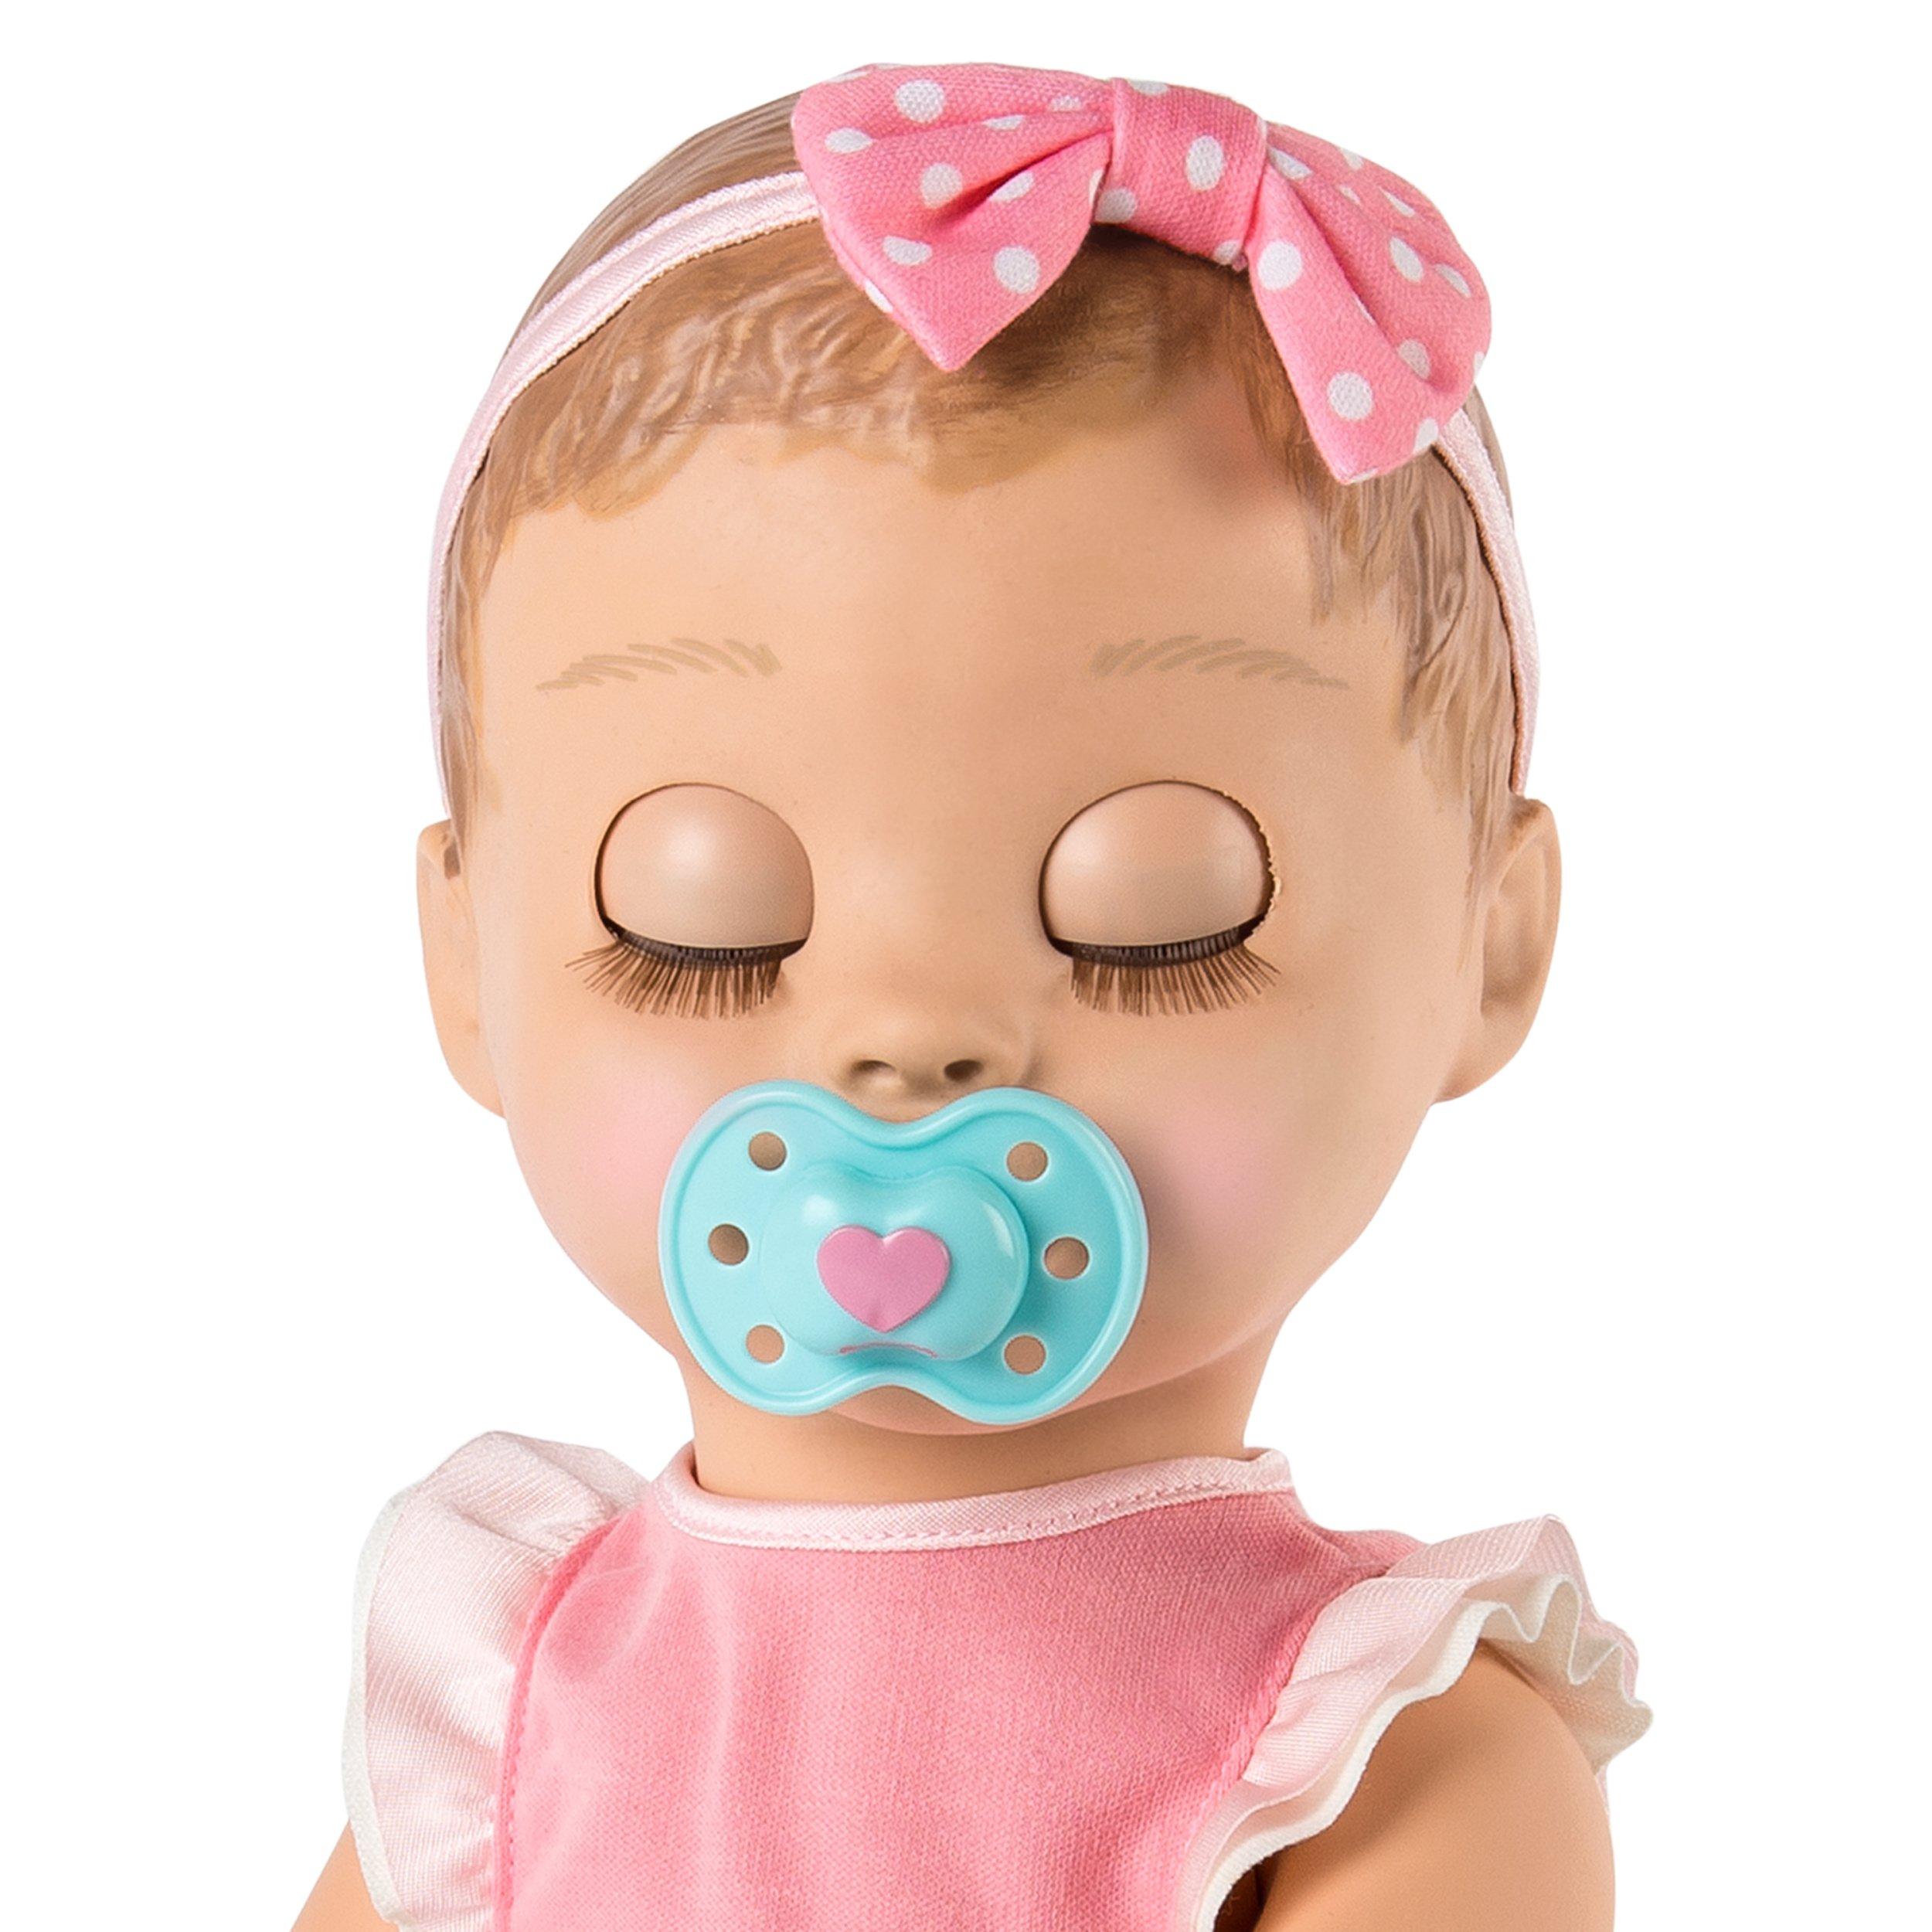 Blonde Hair Responsive Luvabella Baby Doll